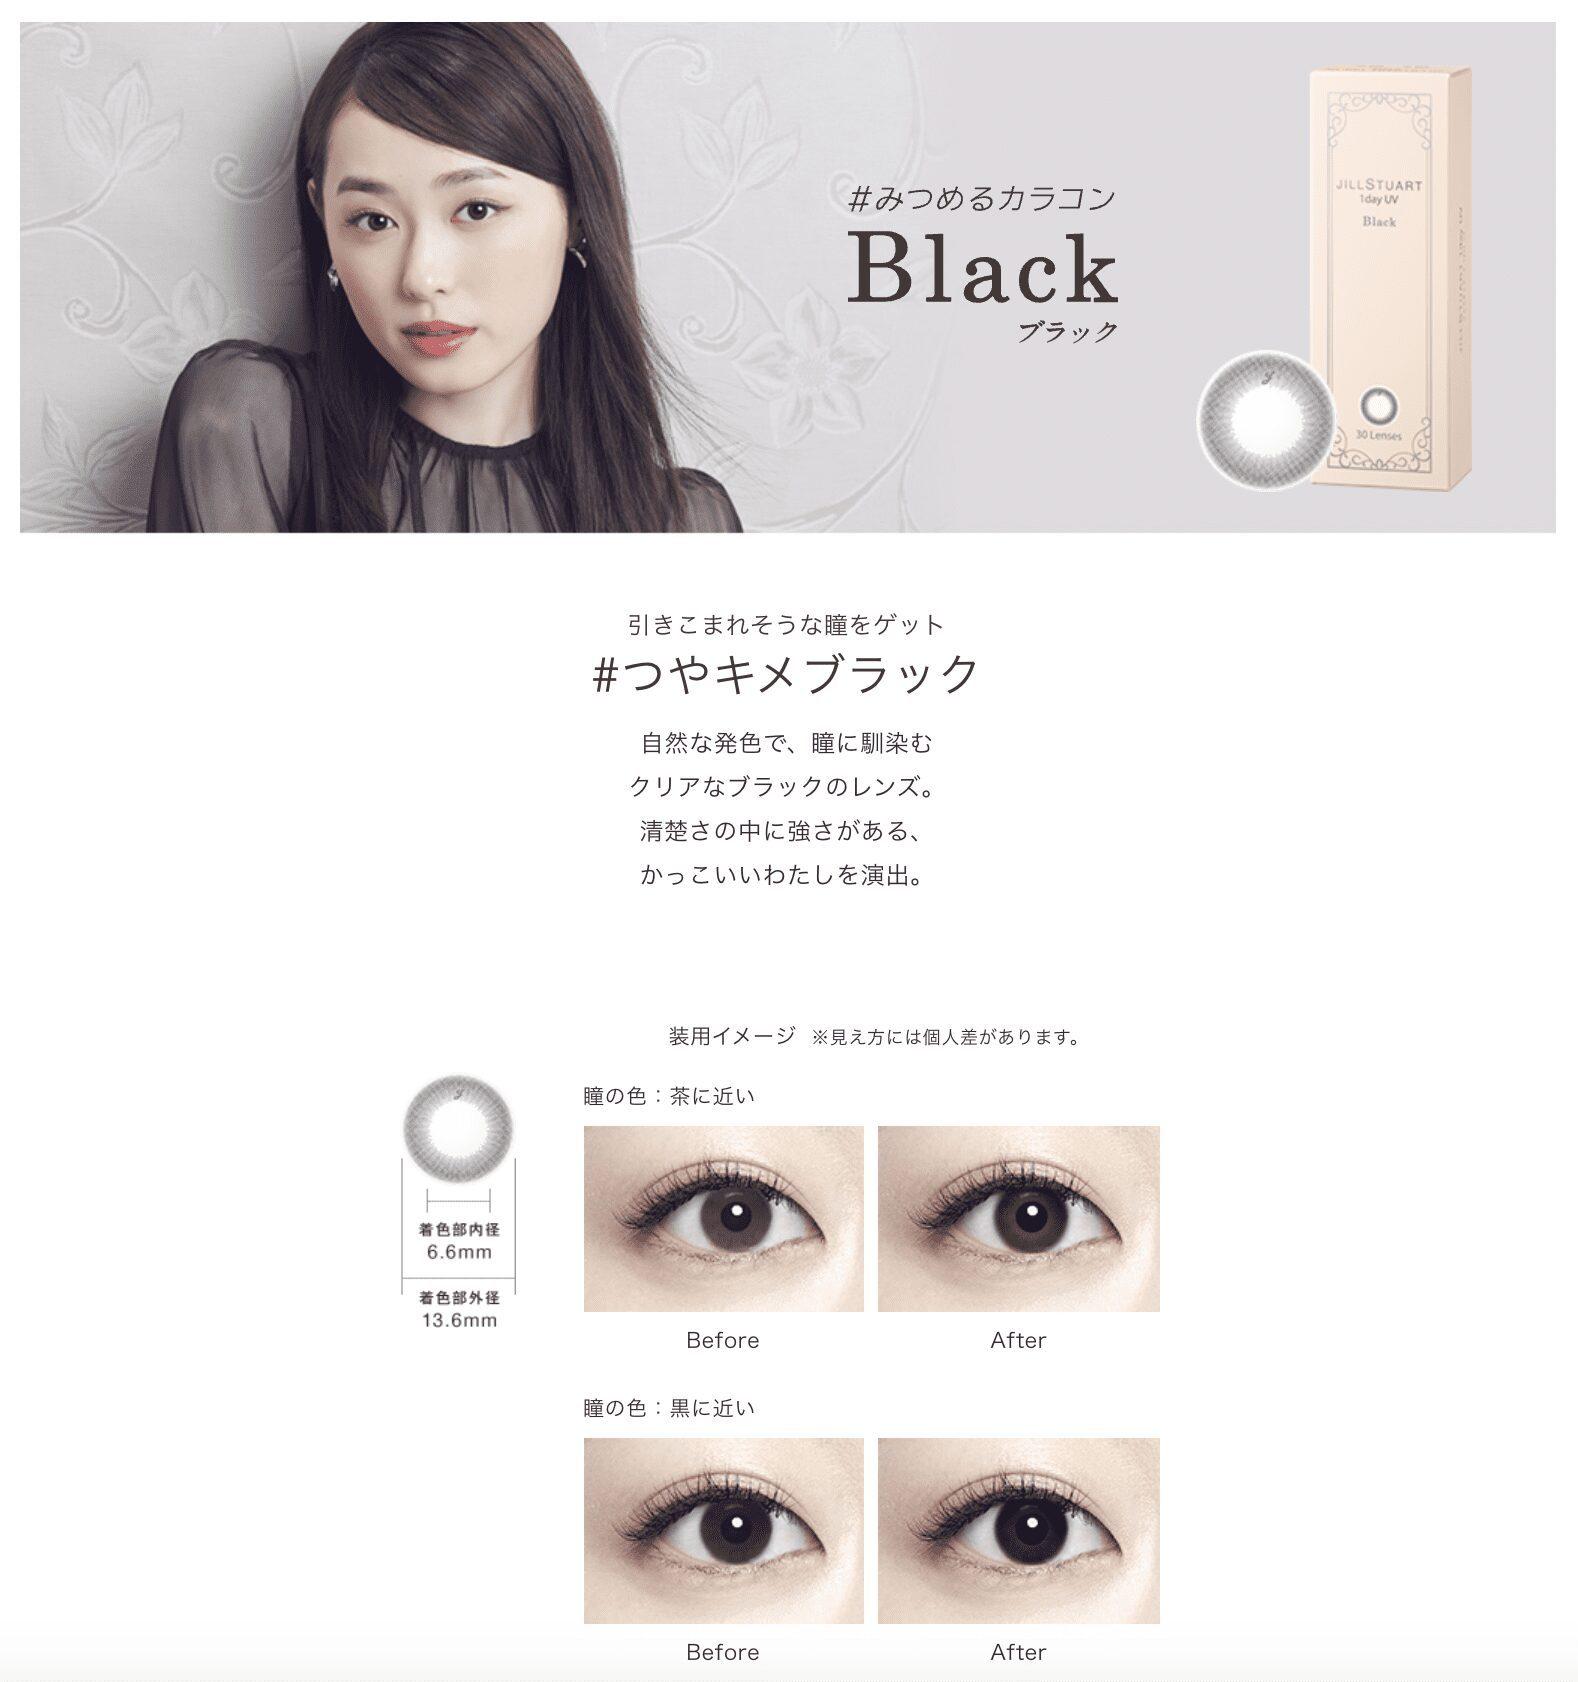 jill-stuart black